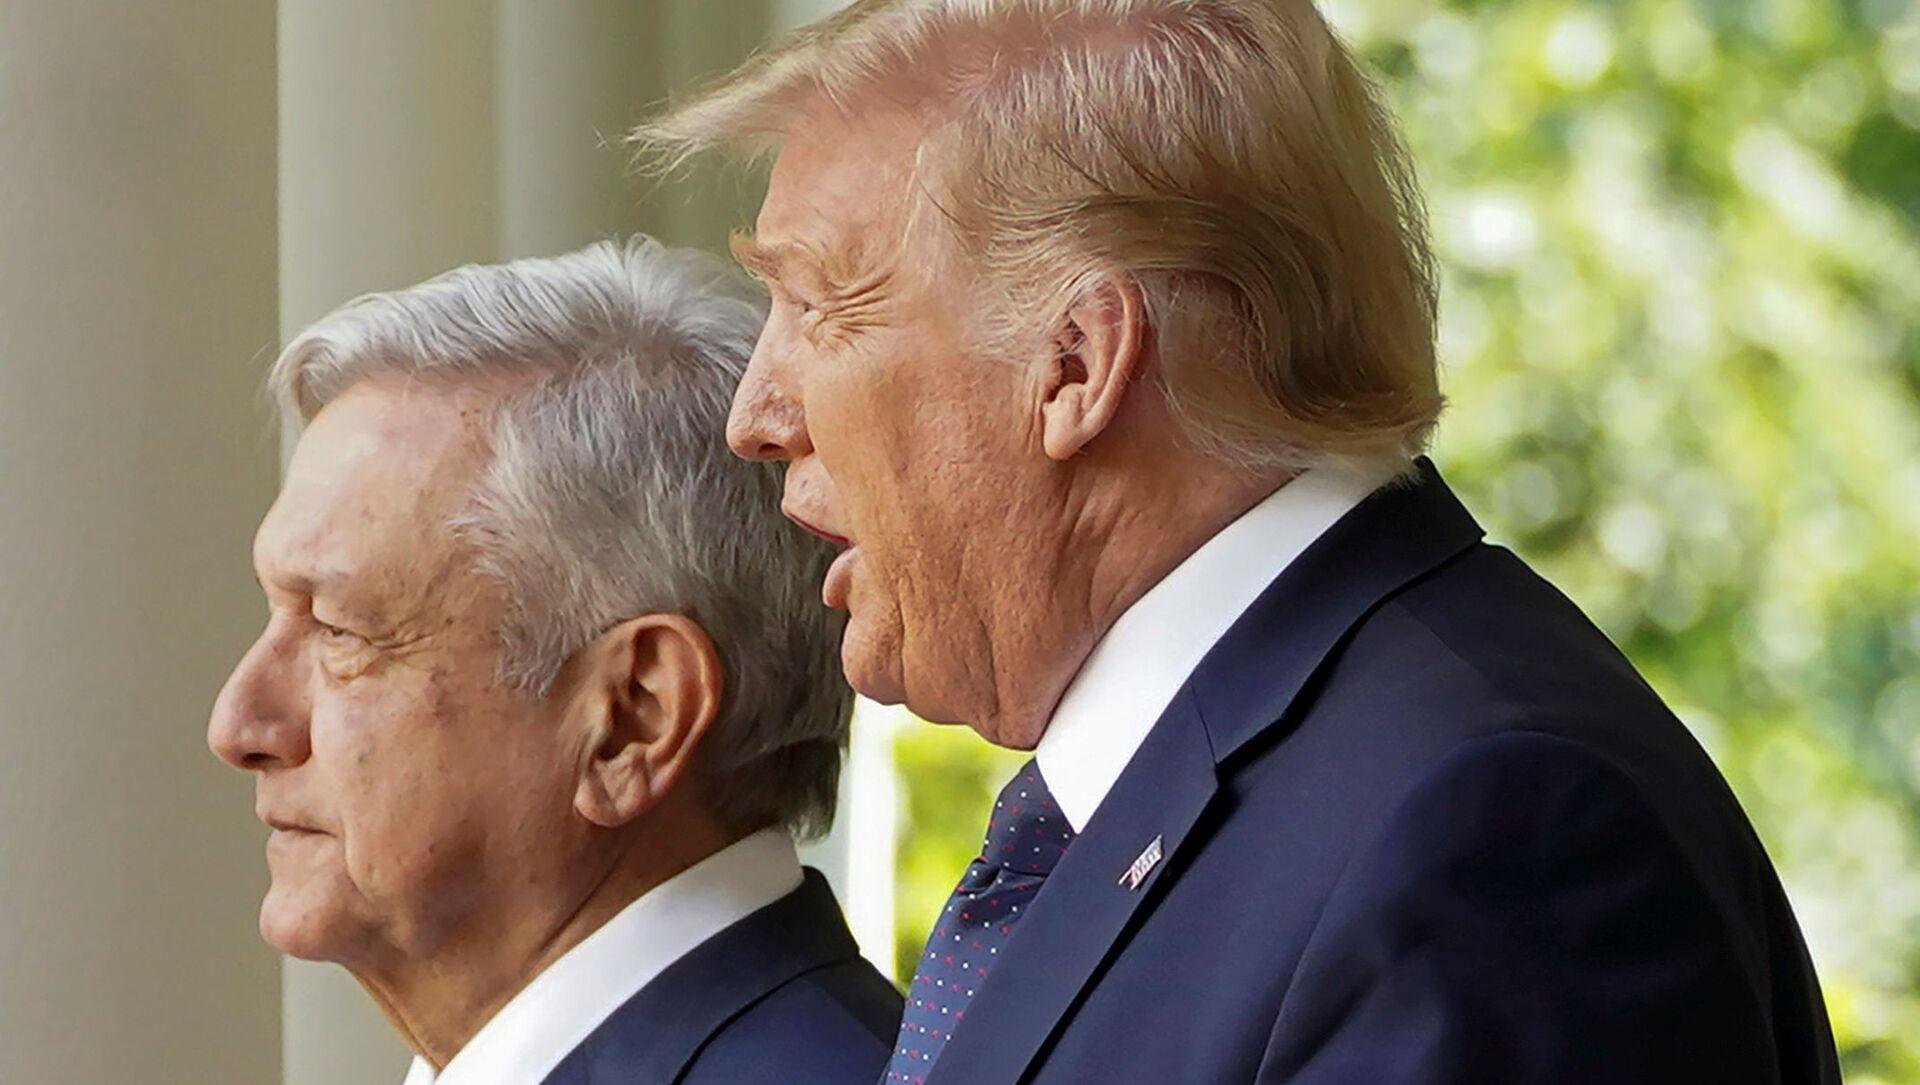 El presidente de México, Andrés Manuel López Obrador, junto a su homólogo estadounidense, Donald Trump - Sputnik Mundo, 1920, 09.07.2020